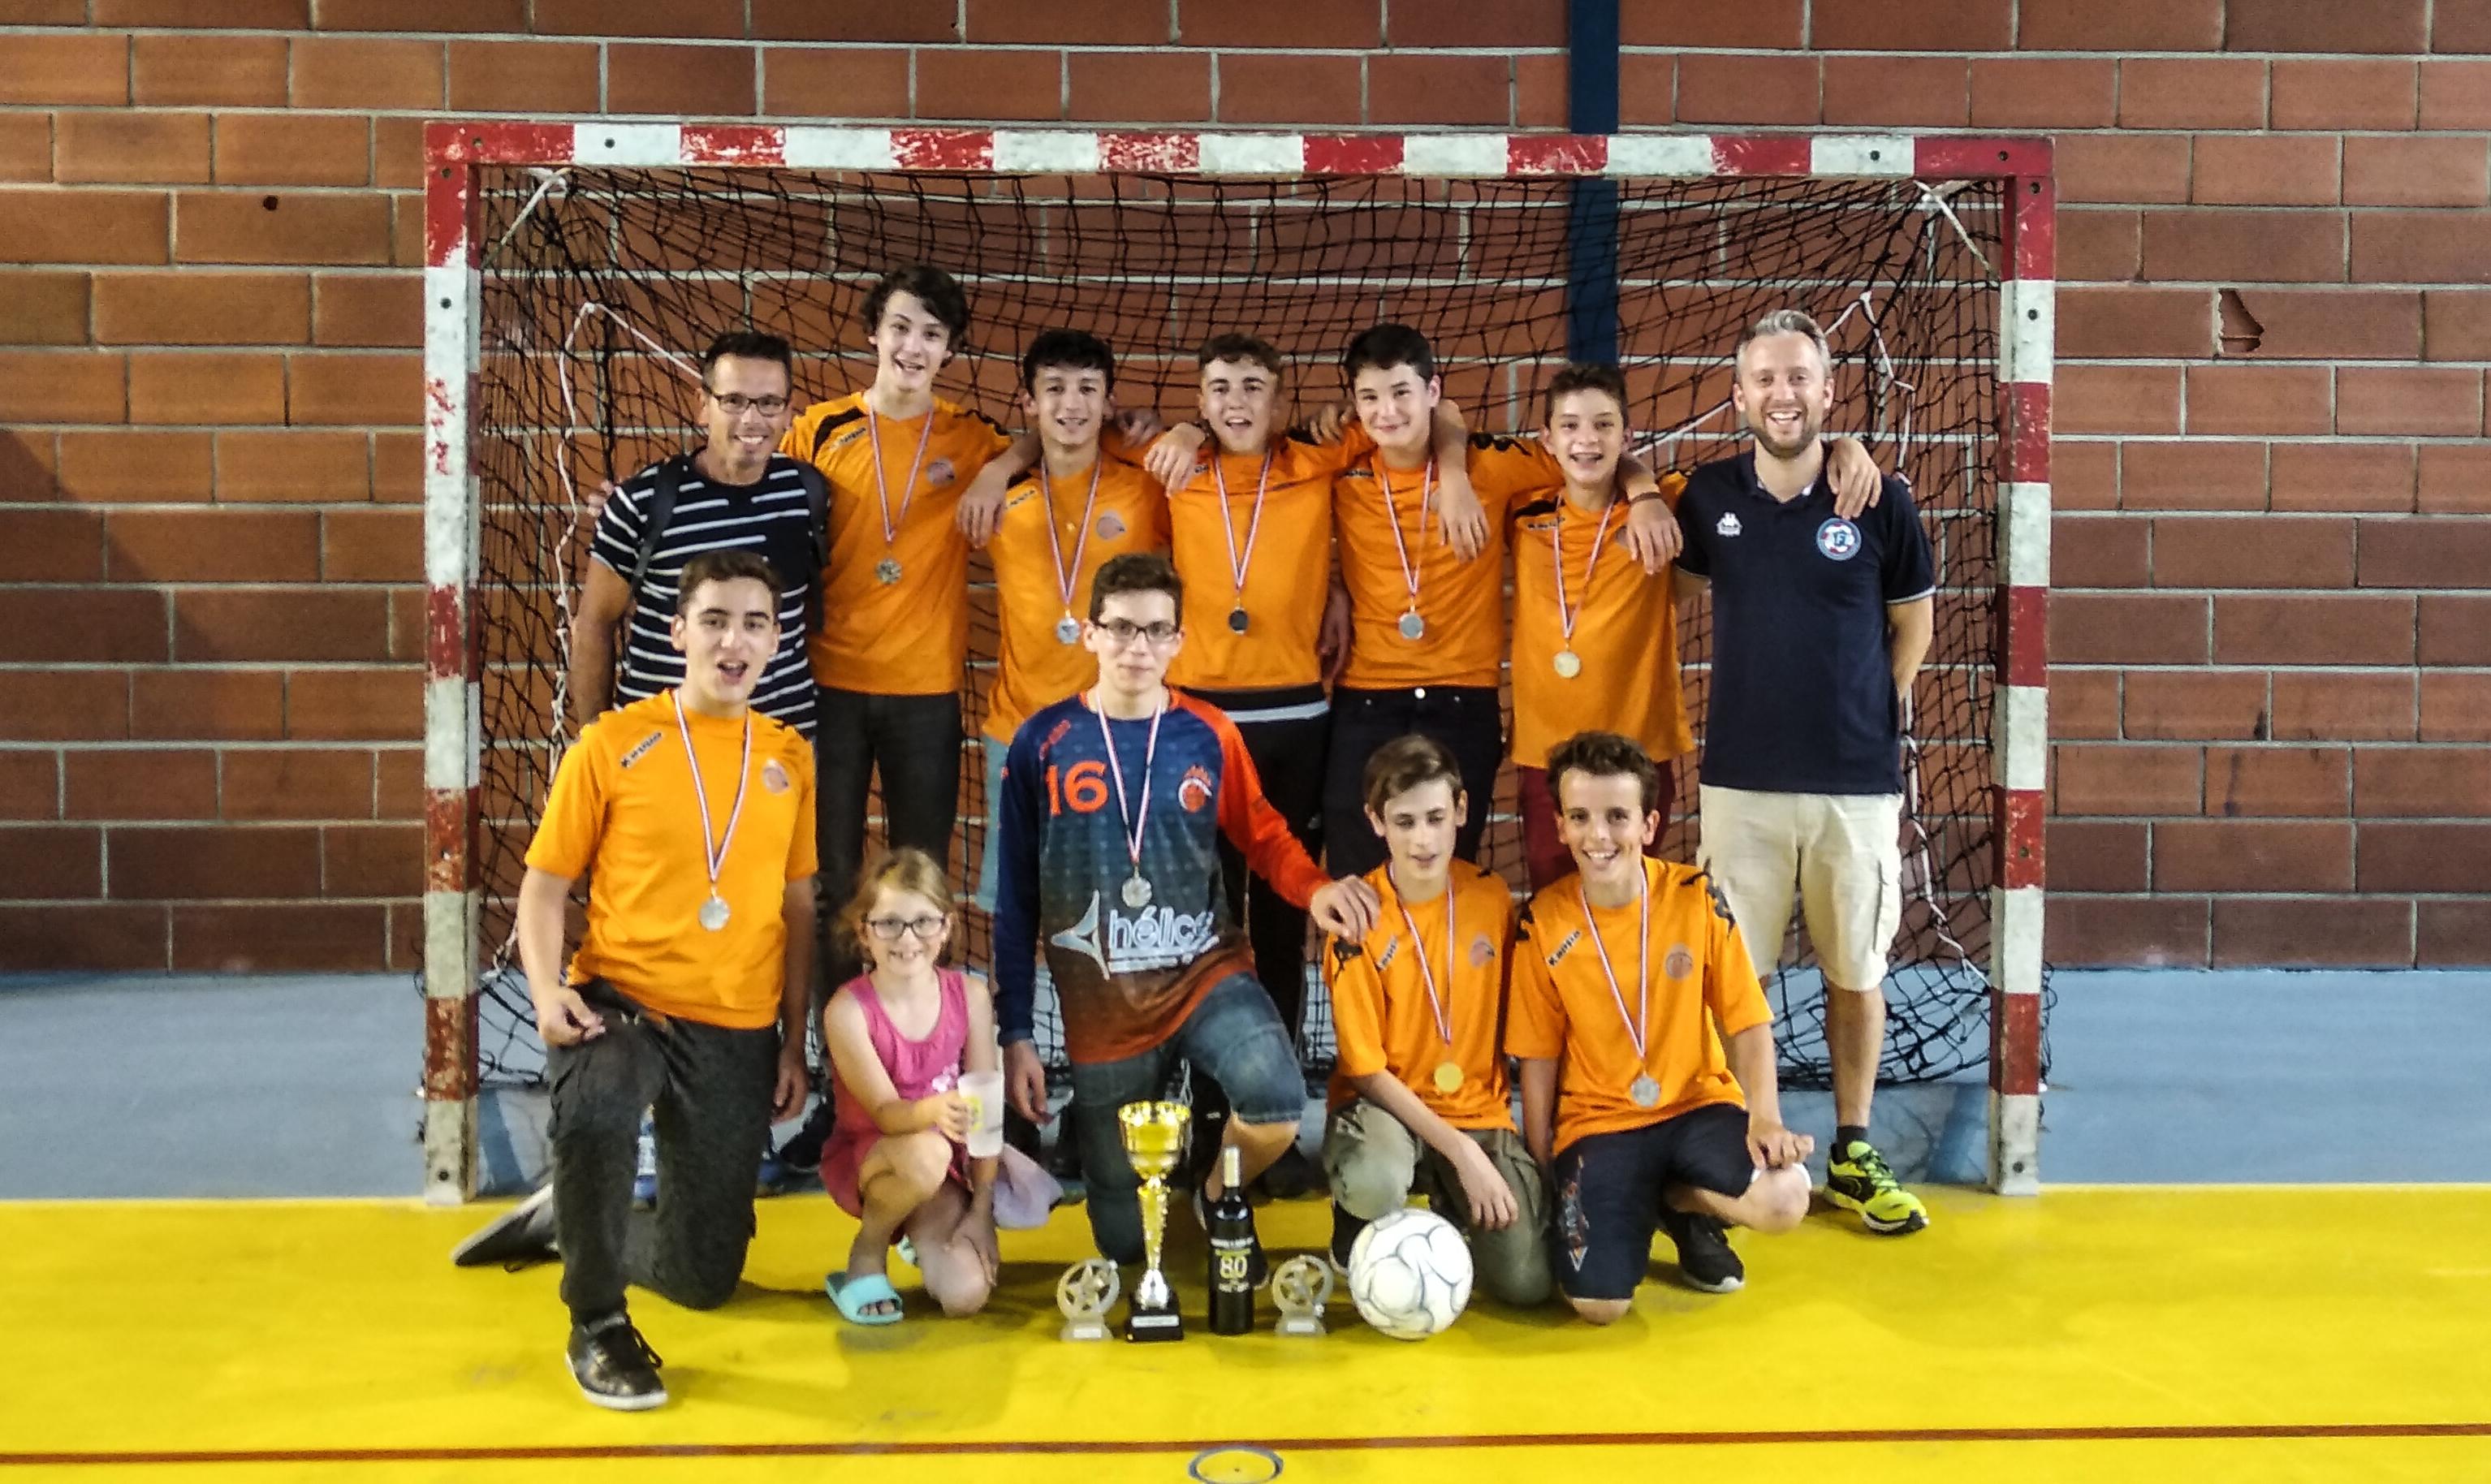 team U15 romorantin futsal club